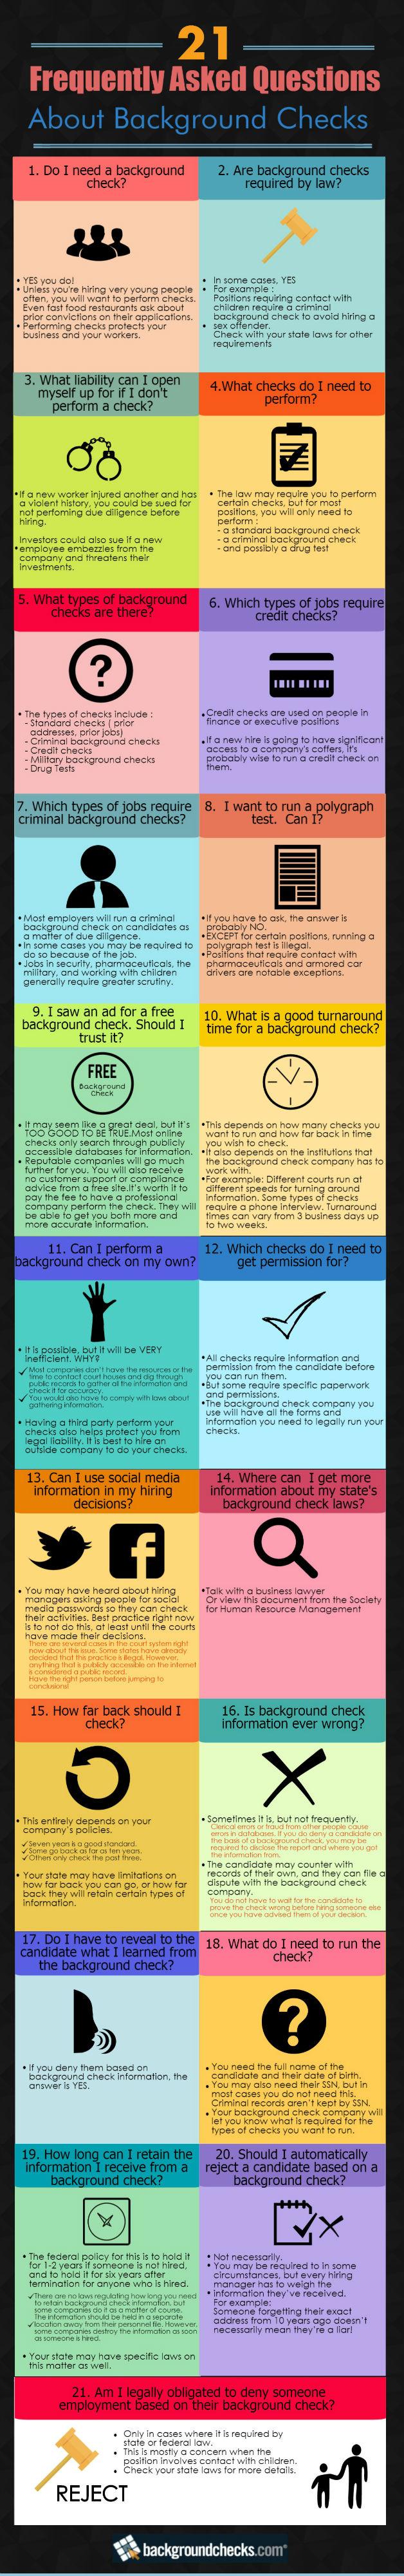 Background Check QA [Infographic]